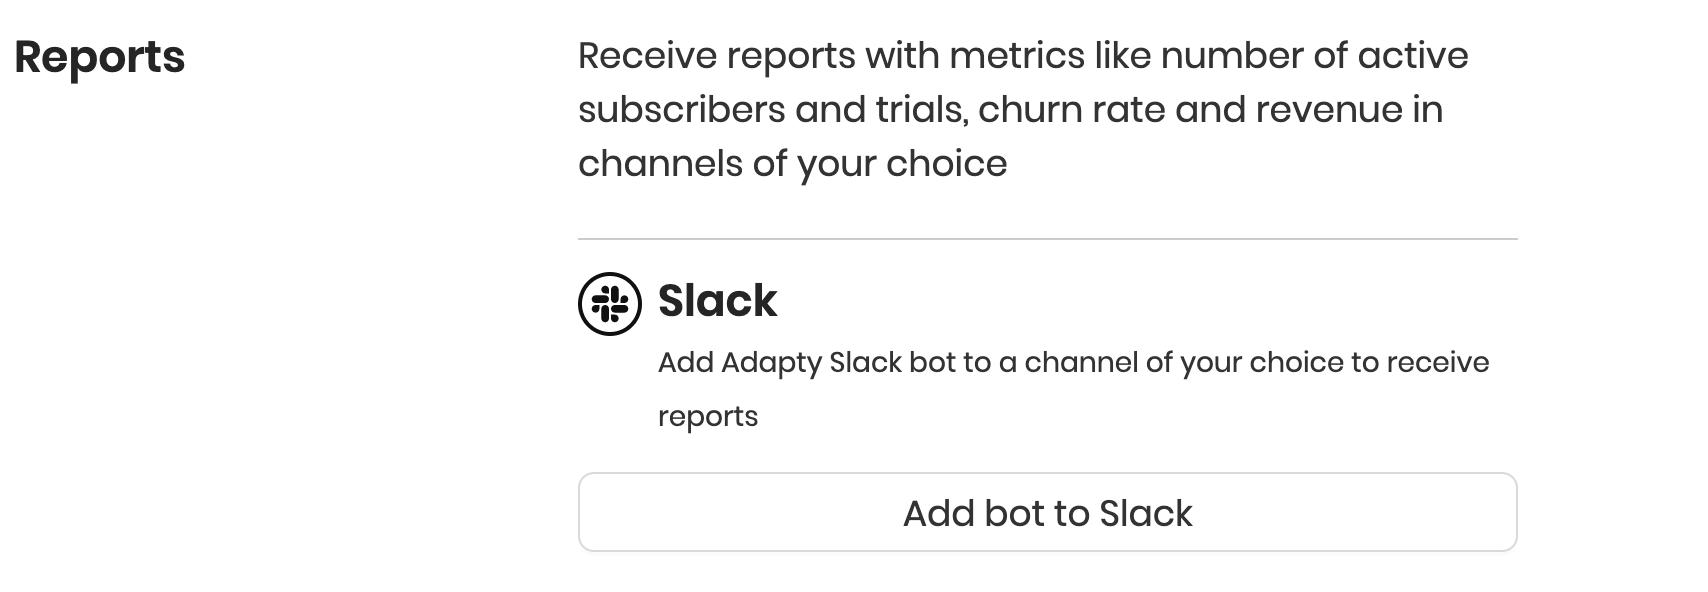 Slack reports activation